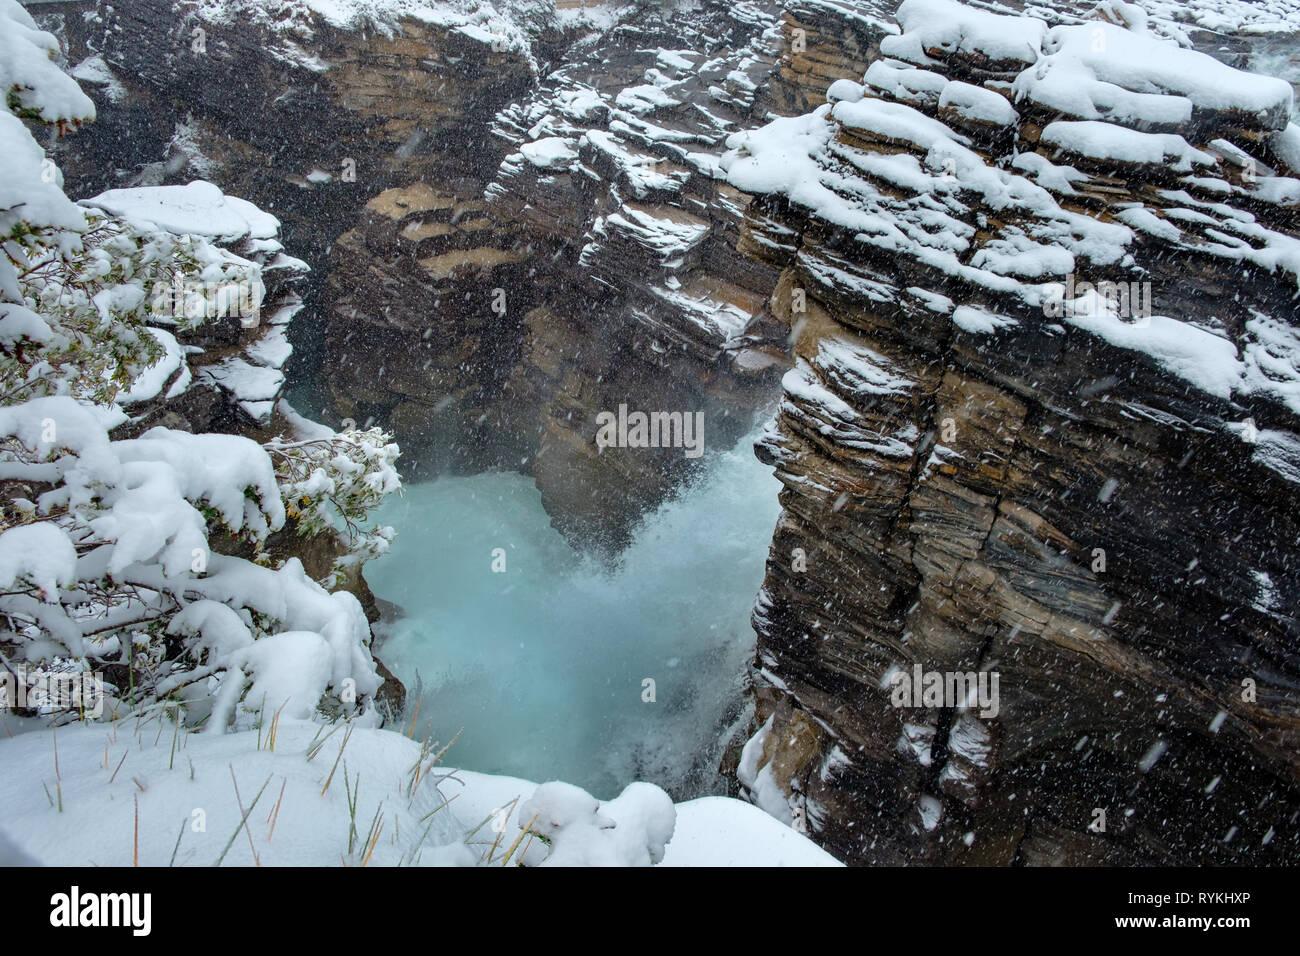 It's a Snowy morning at Athabasca Falls, Jasper, Canada. Stock Photo